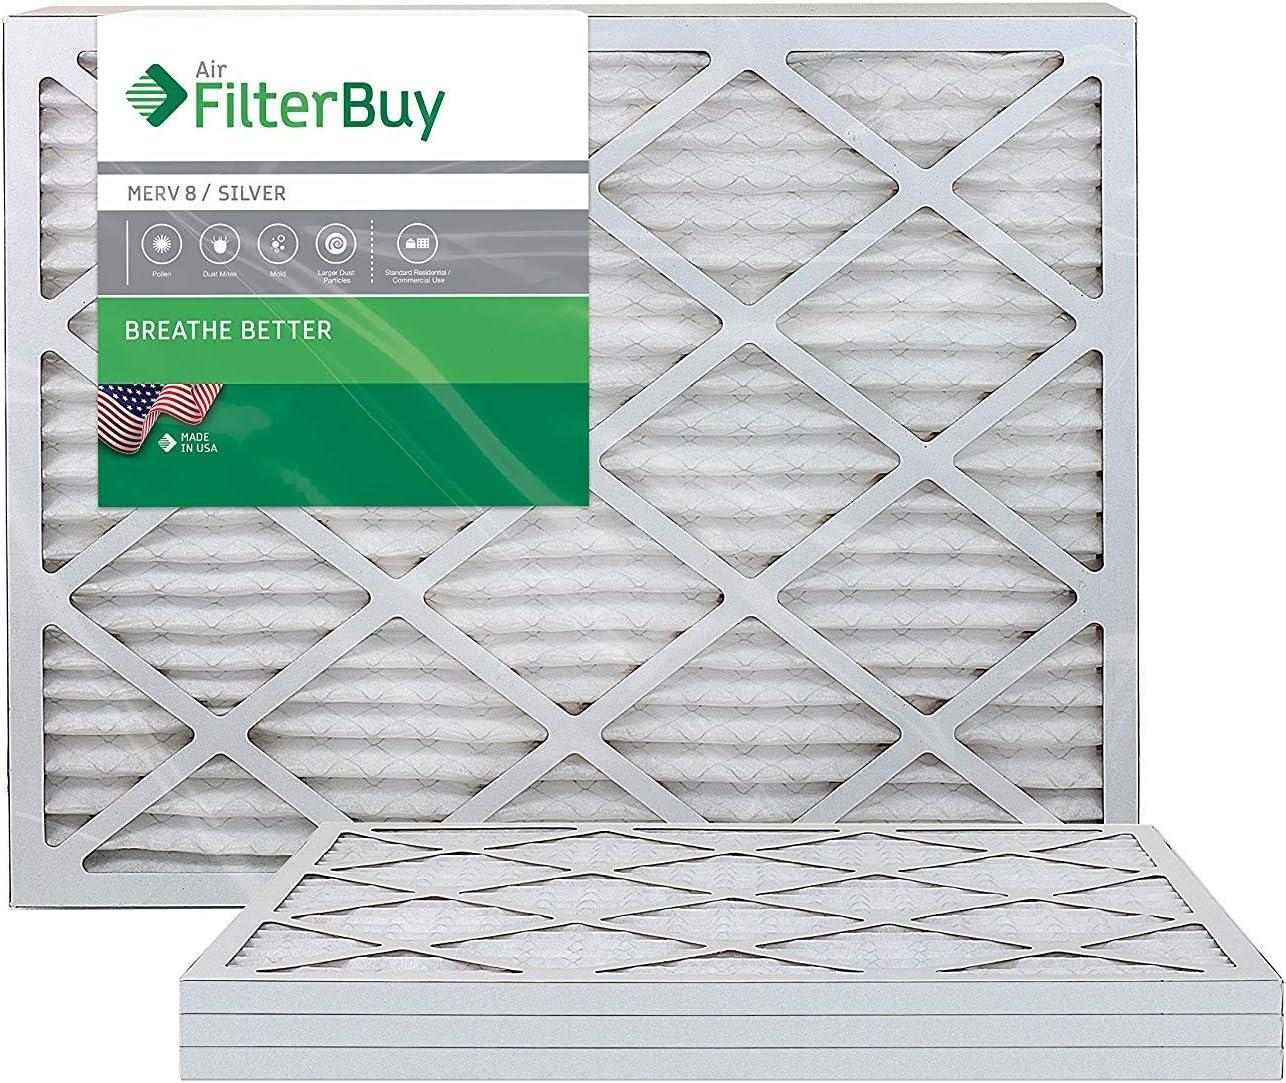 20x25x1 Merv 8 Furnace Filter 12 Pack